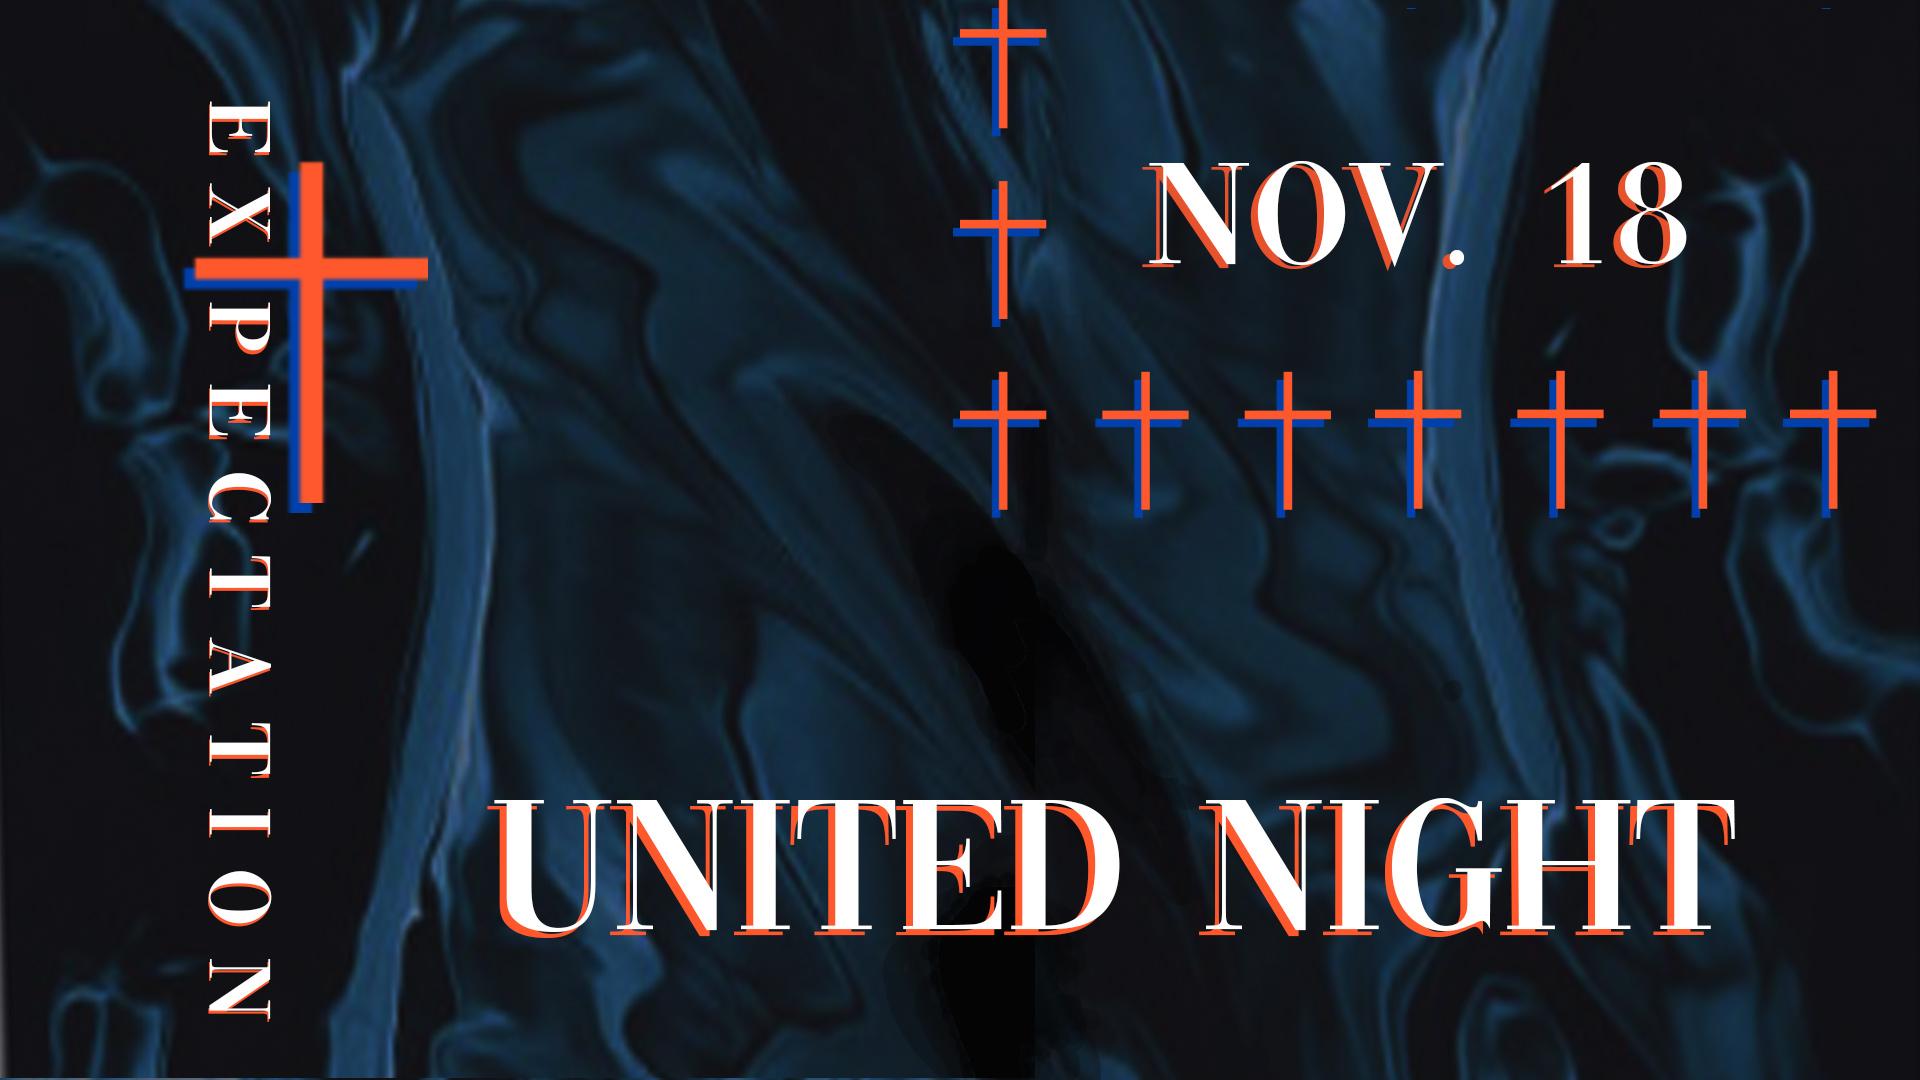 united night final.jpg